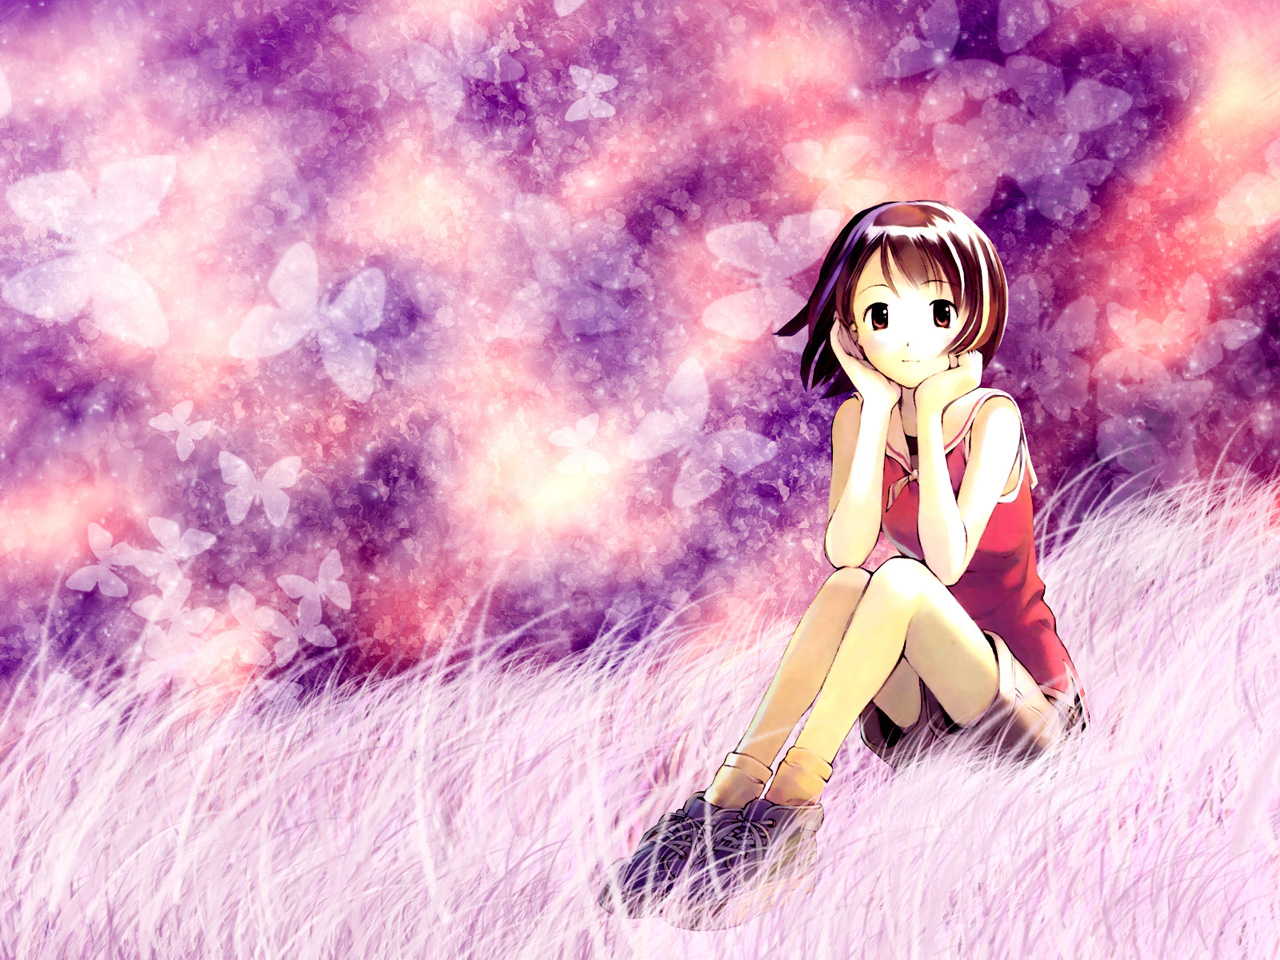 Cute anime wallpapers for desktop wallpapersafari - Cute anime desktop wallpaper ...